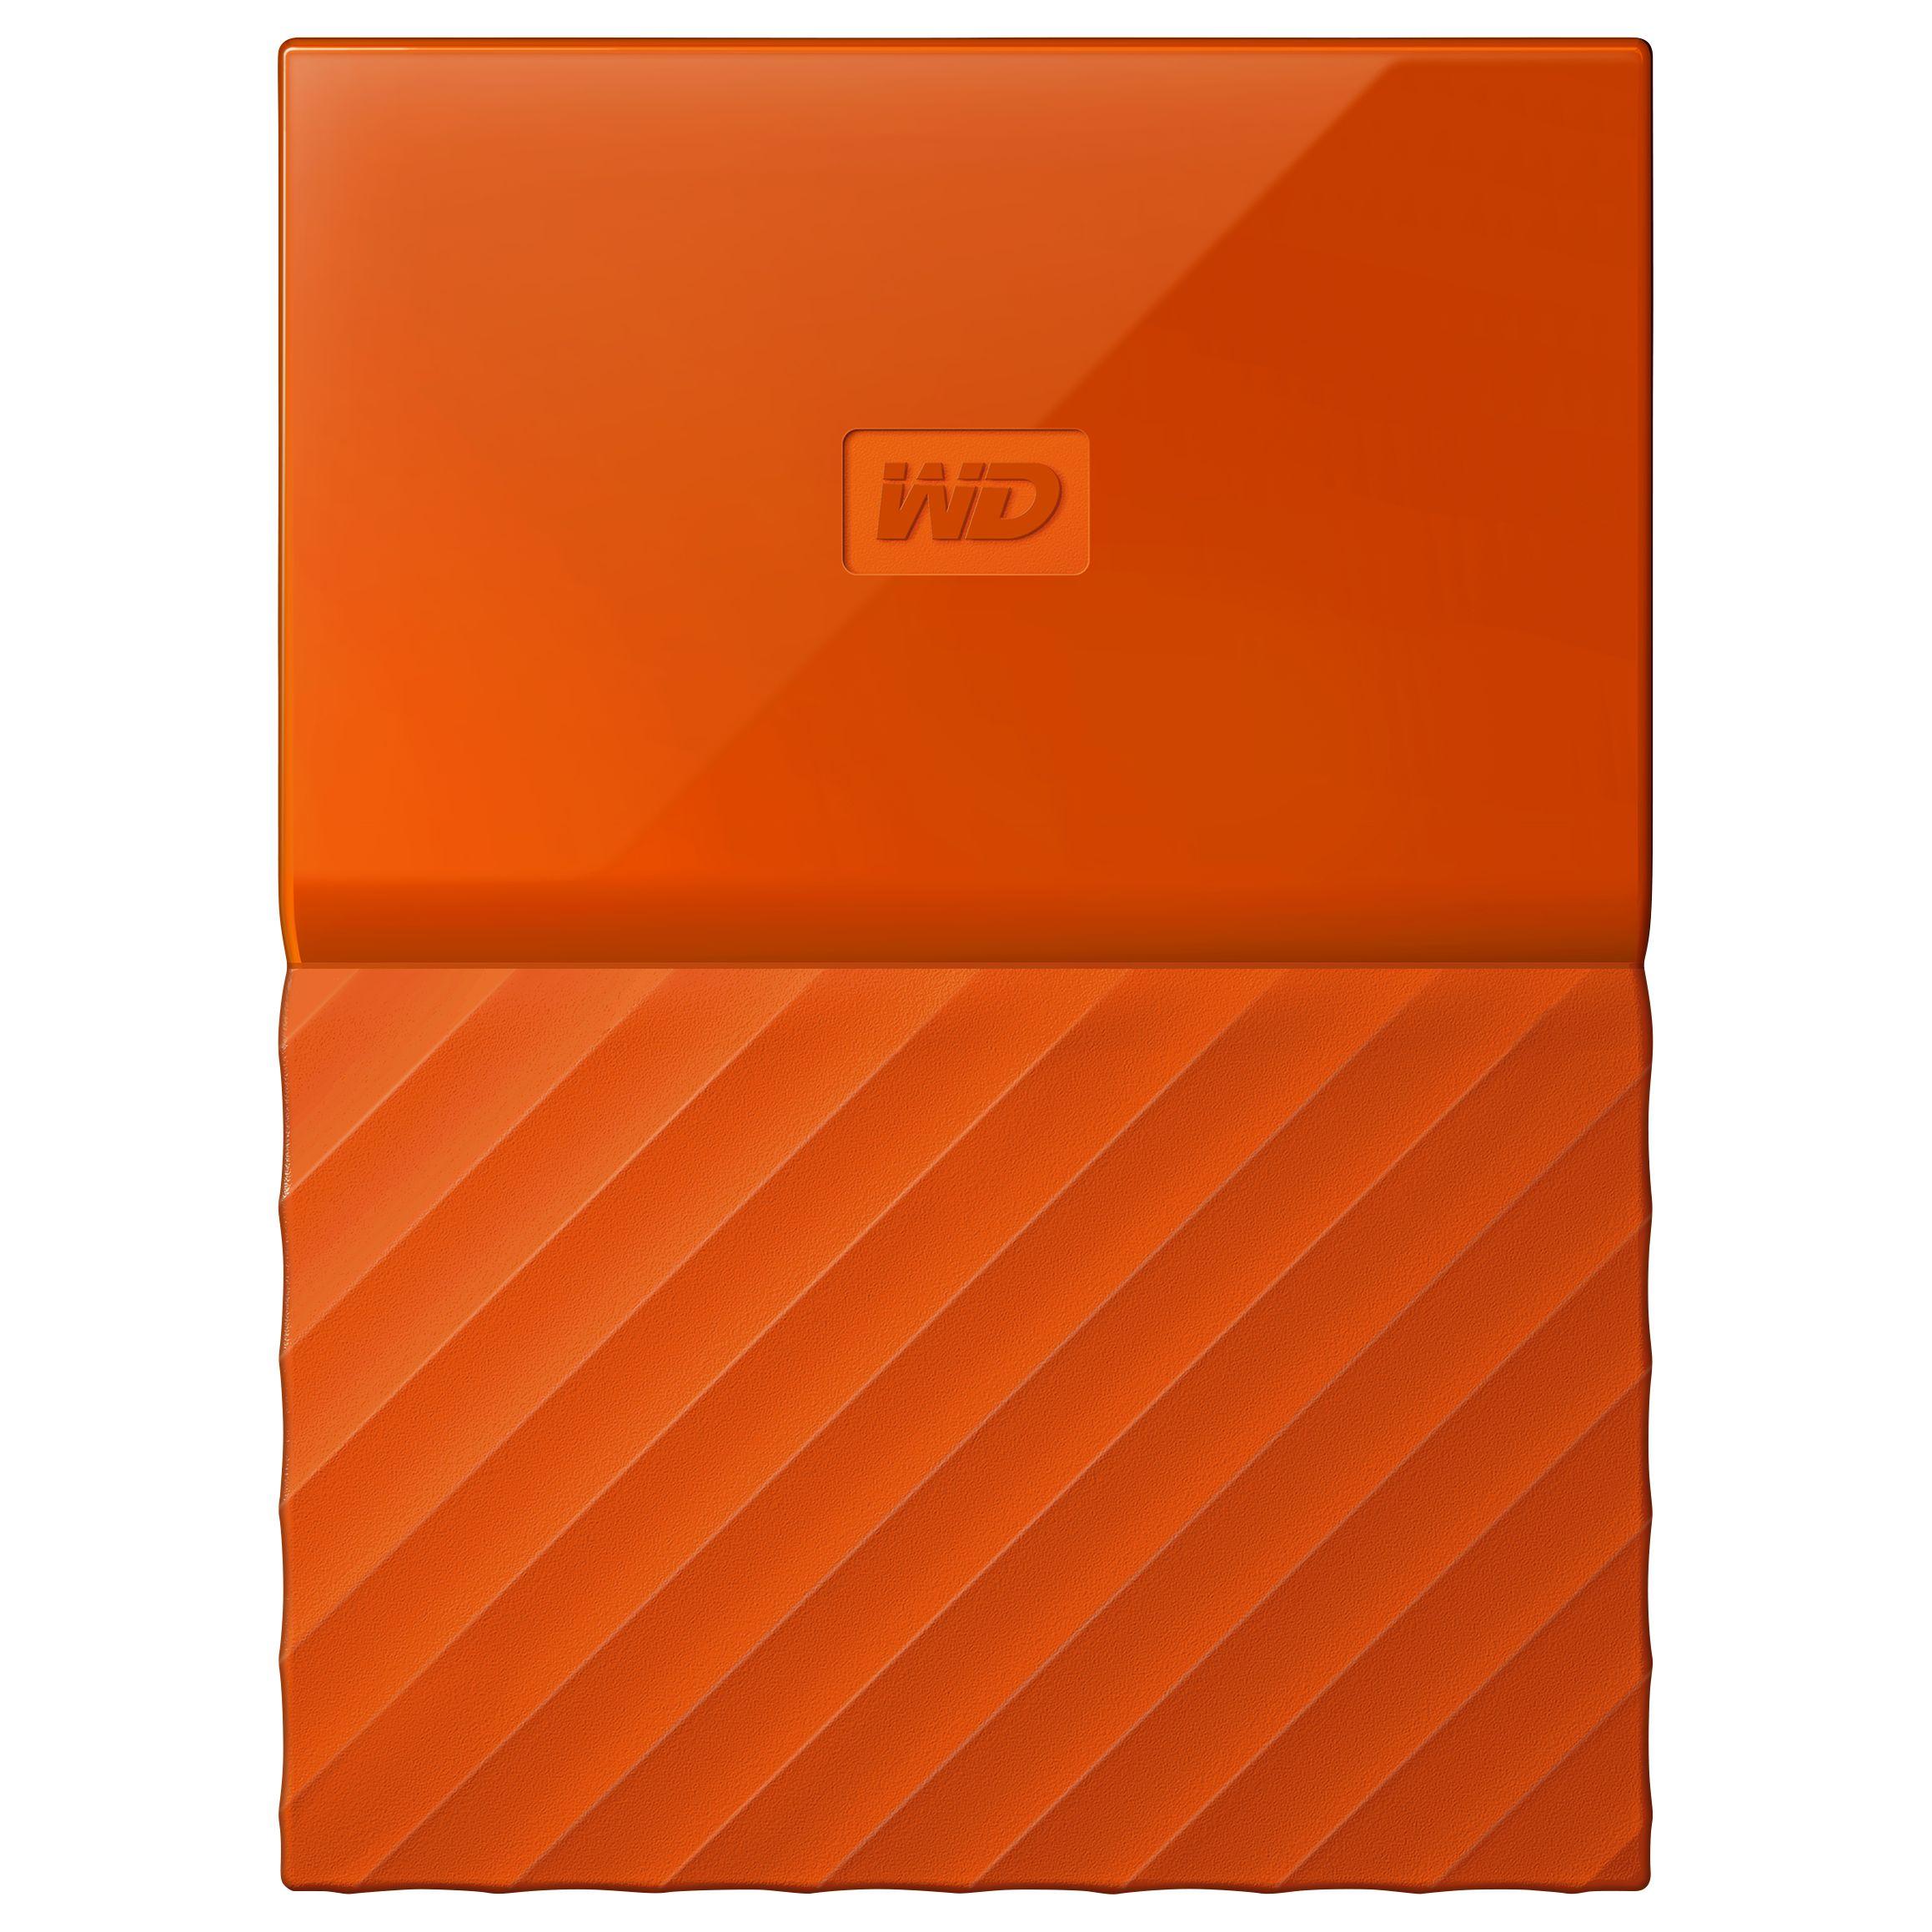 WD WD My Passport Portable Hard Drive, 4TB